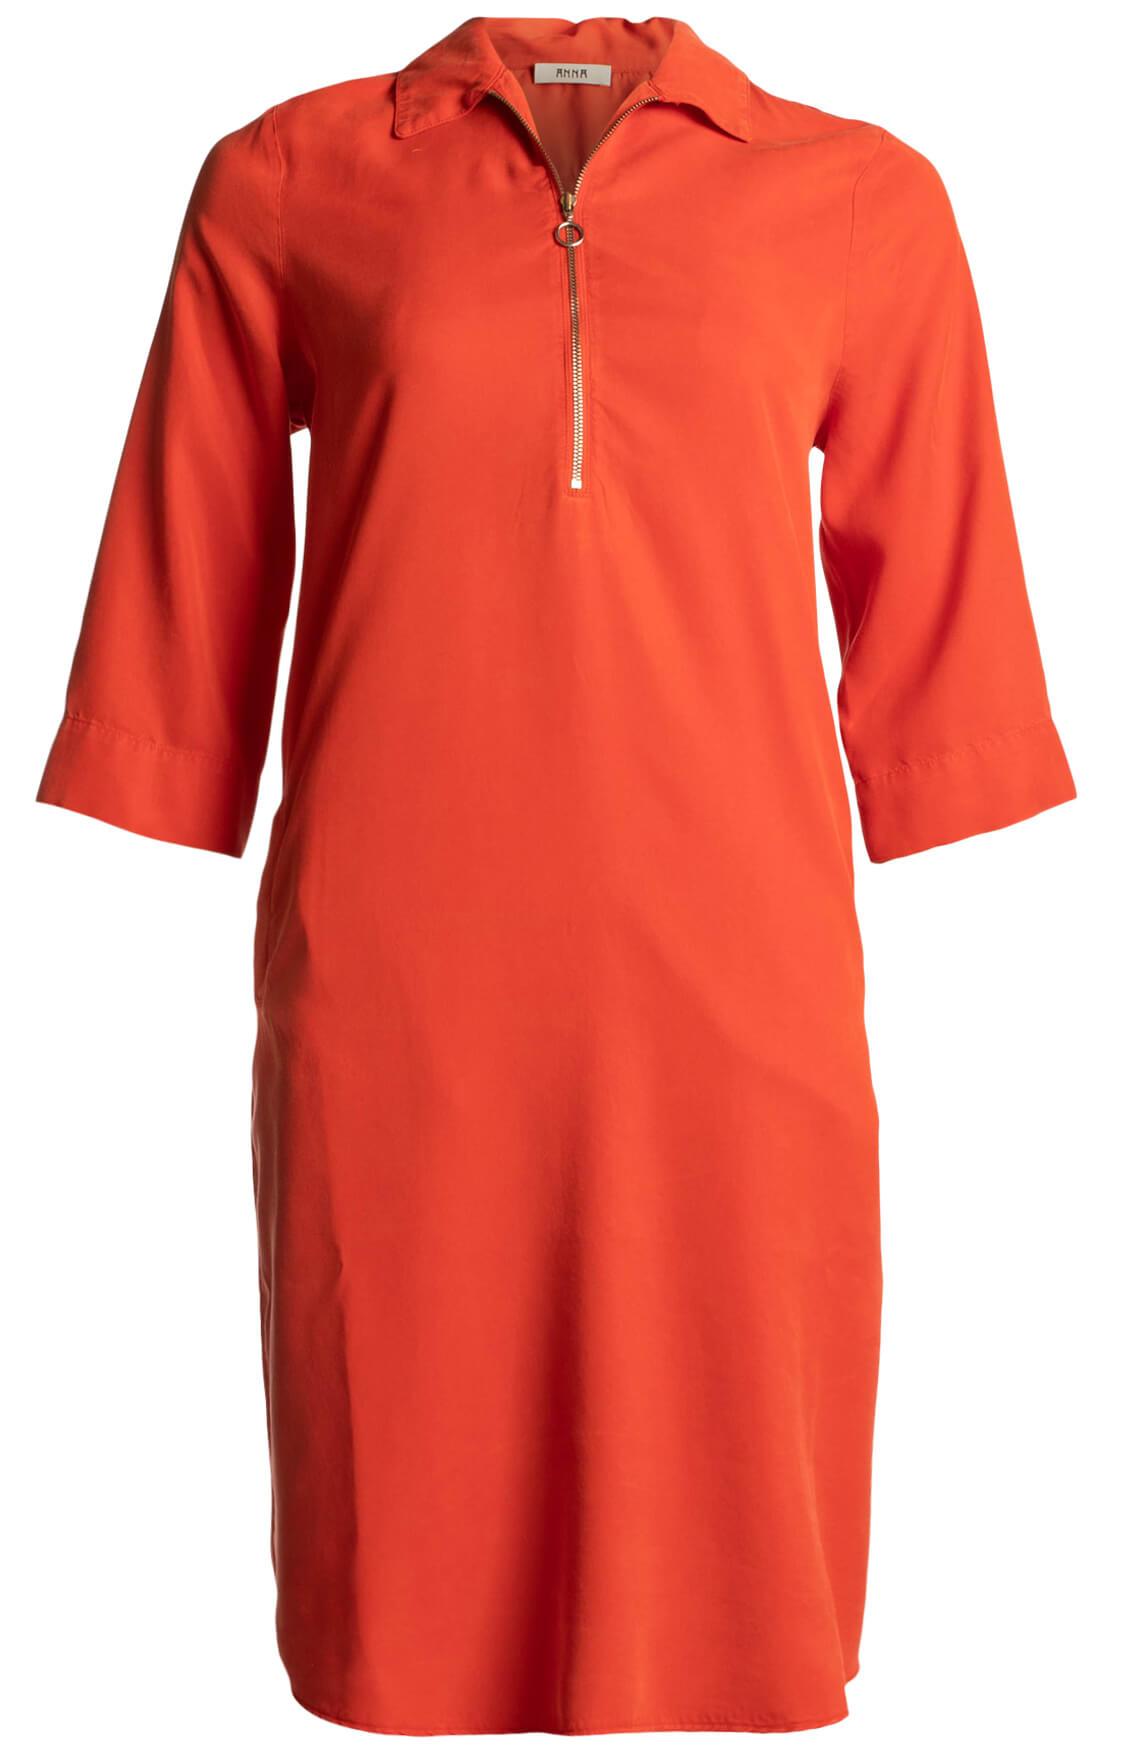 Anna Dames Tencel jurk Rood